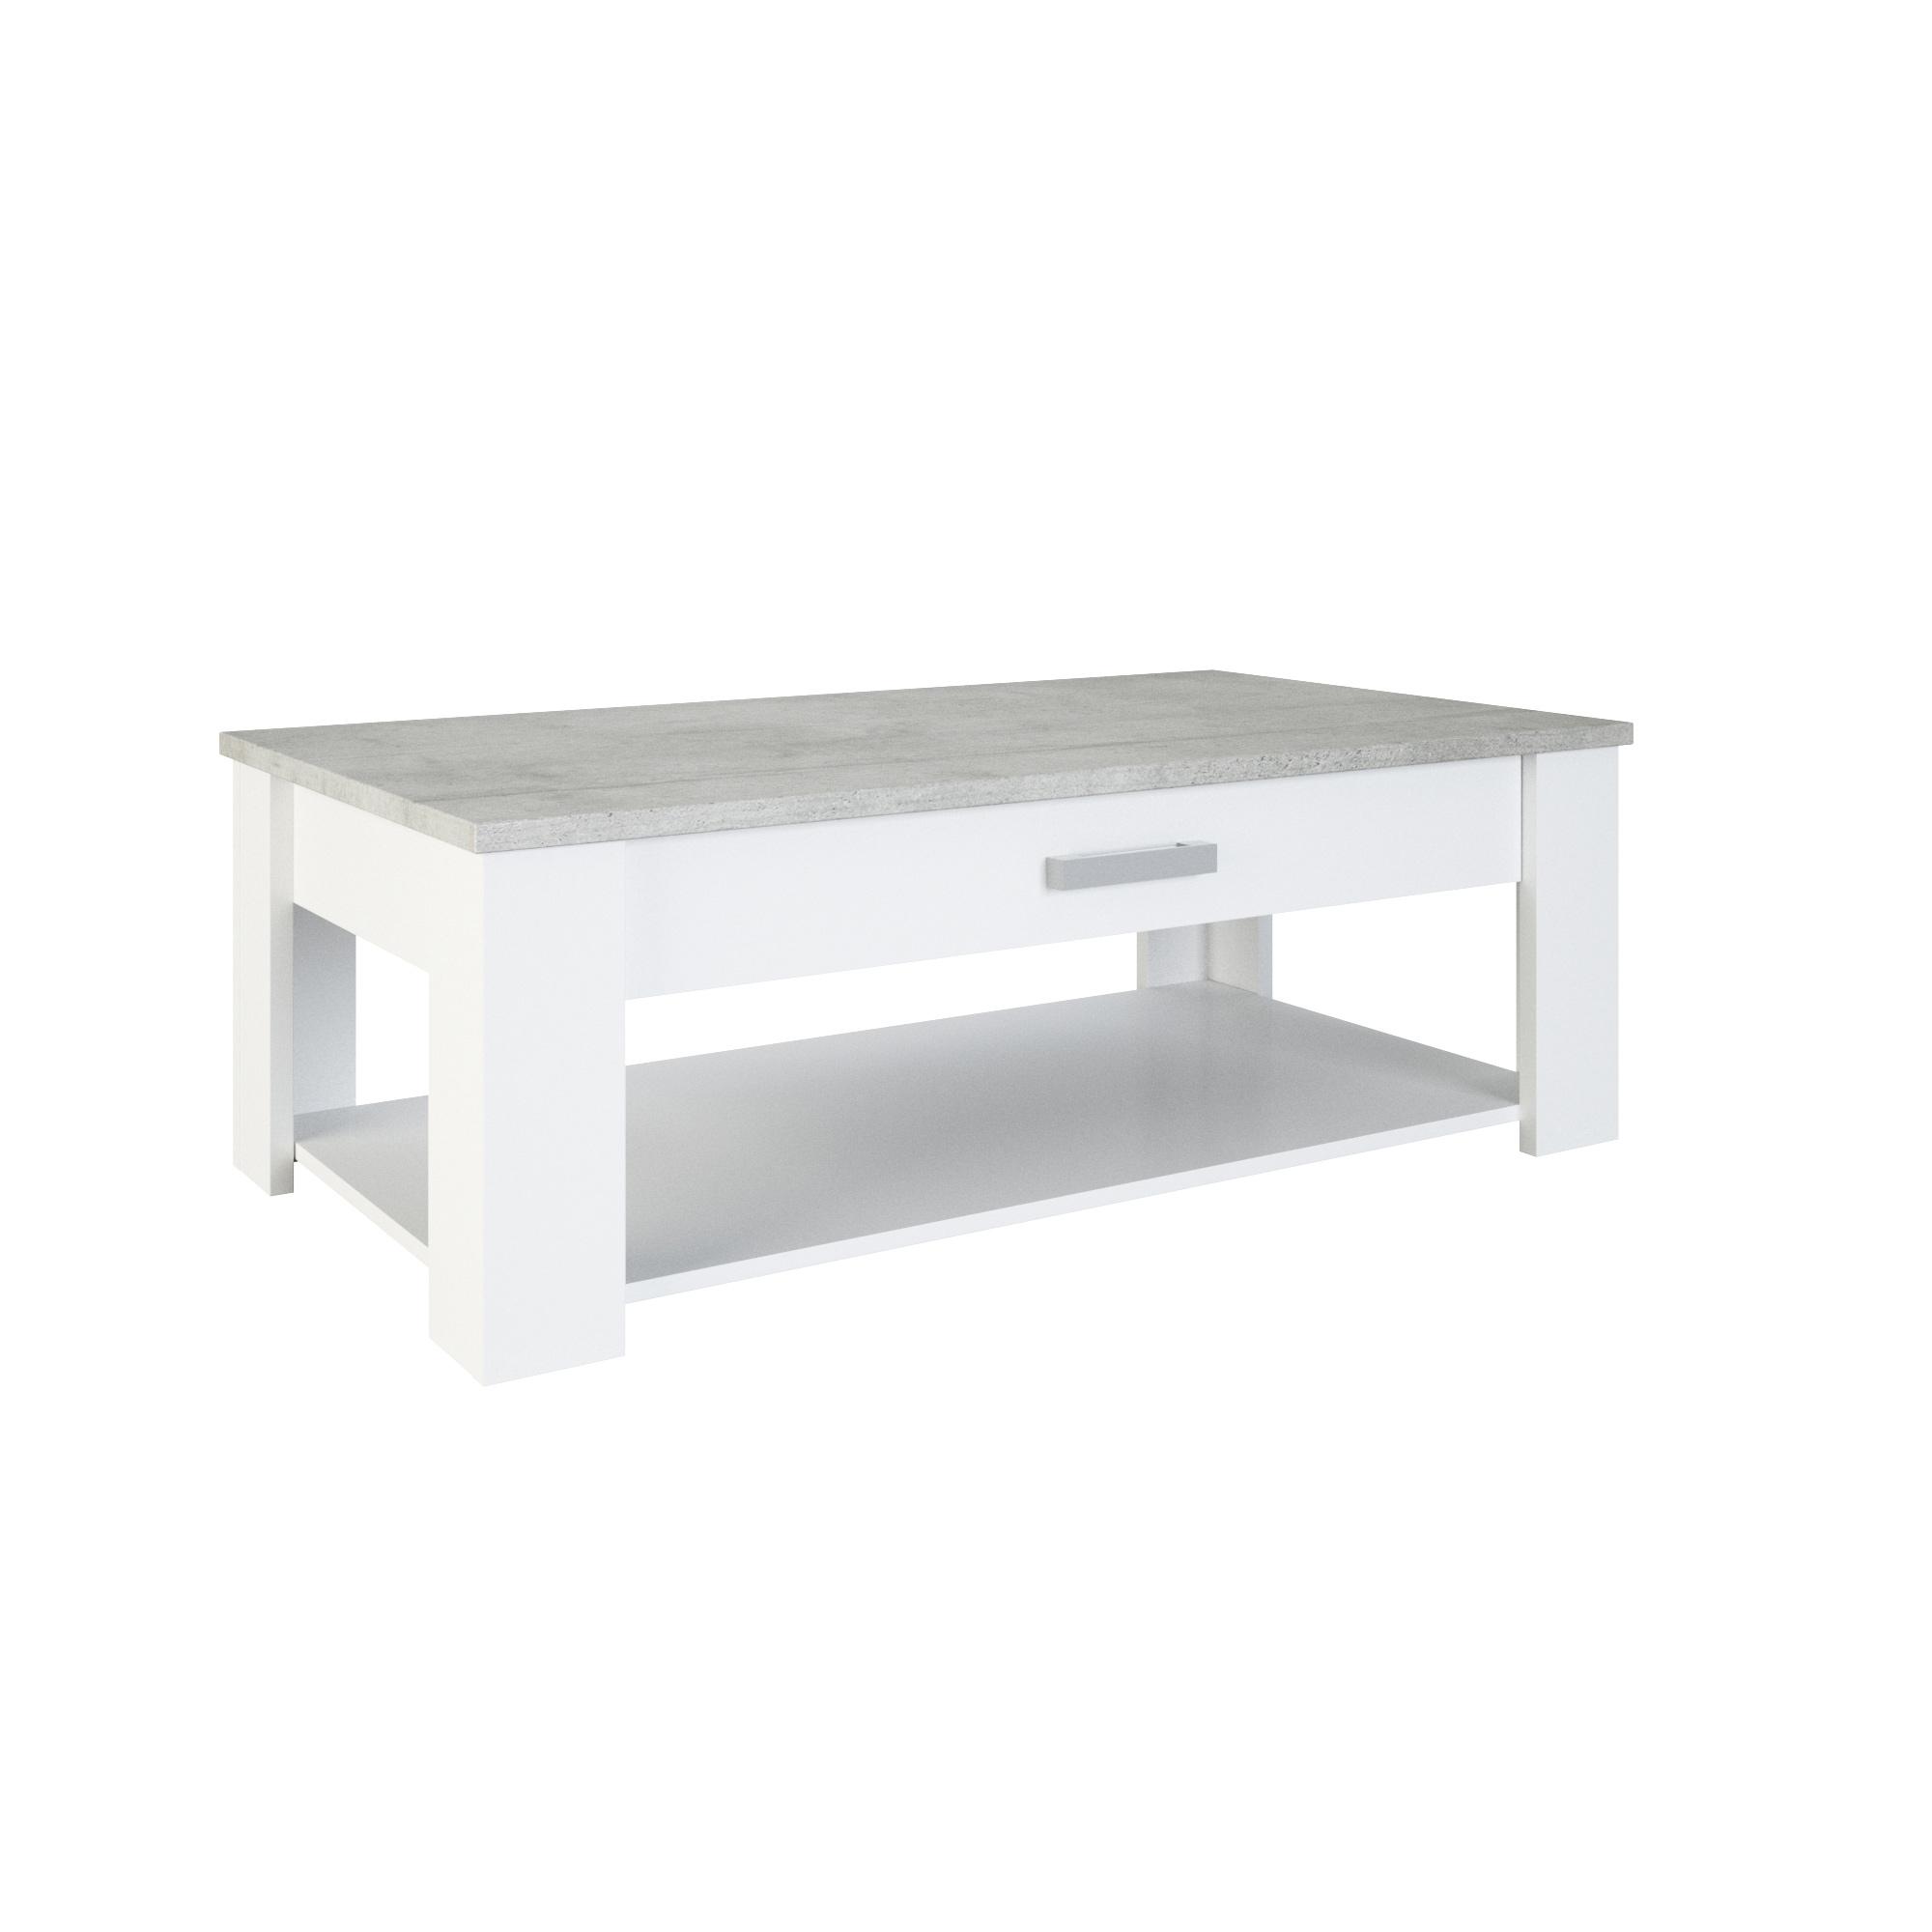 Table basse contemporaine blanc perle/gris Torento